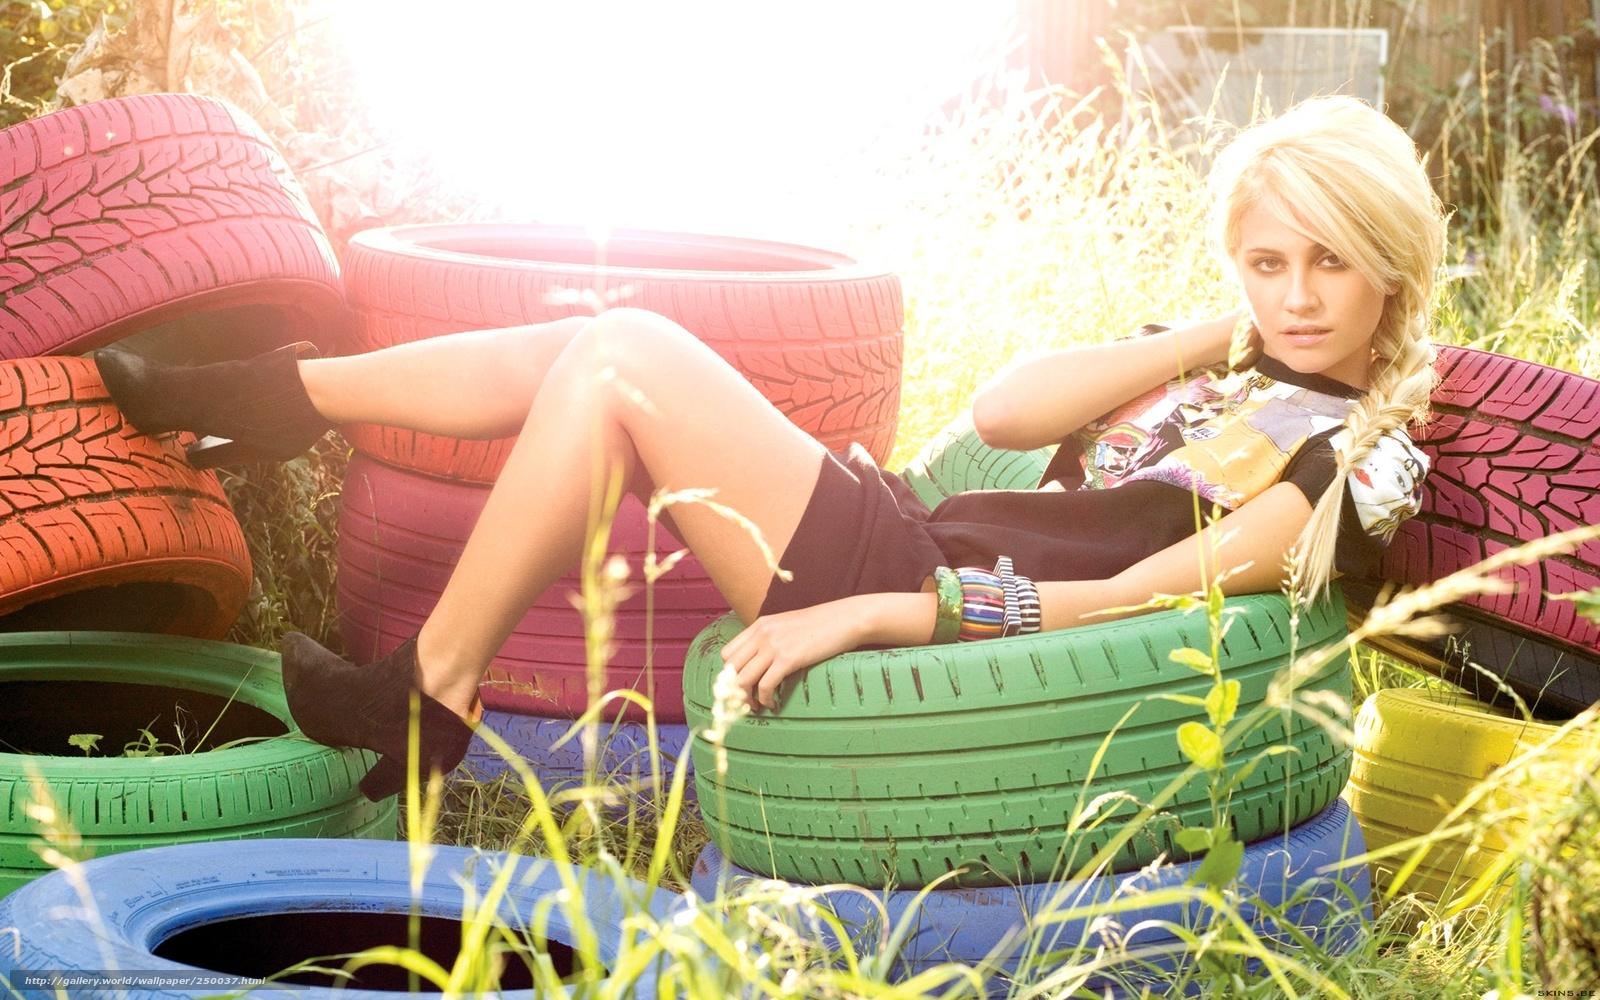 Pixie teen models erotica scene